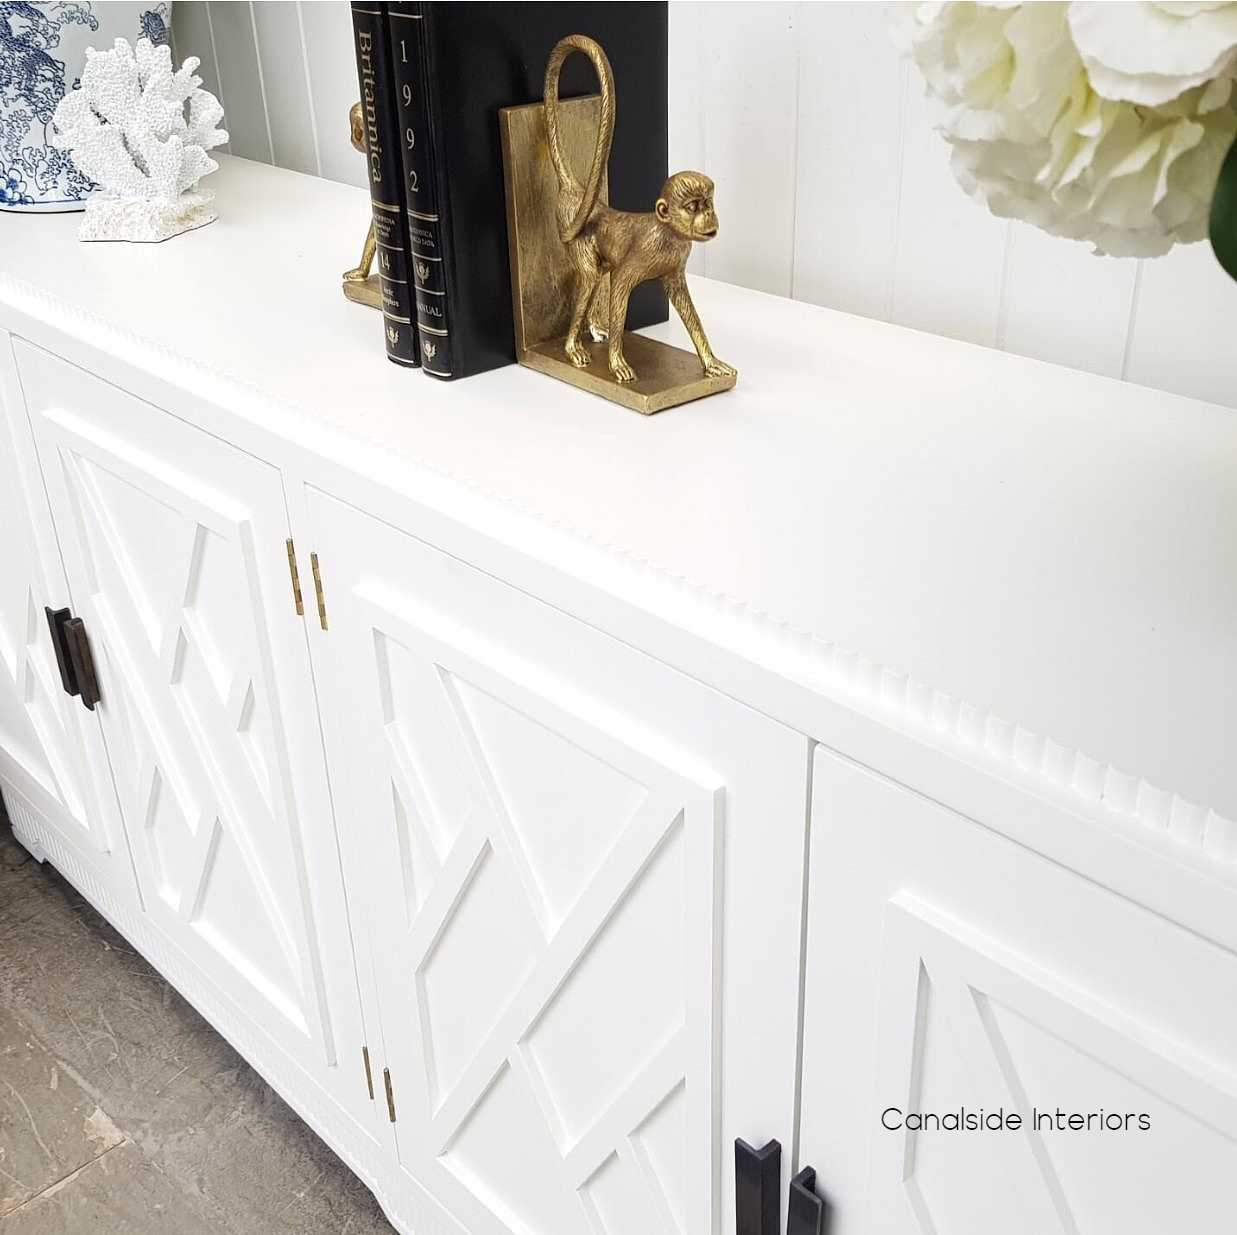 Ellery 4 Door Sideboard White  HAMPTONS Style, PLANTATION Style, LIVING Room, LIVING TV Media & Storage, TABLES Sideboards & Buffets, STORAGE, STORAGE Sideboards & Buffets, PLANTATION STYLE